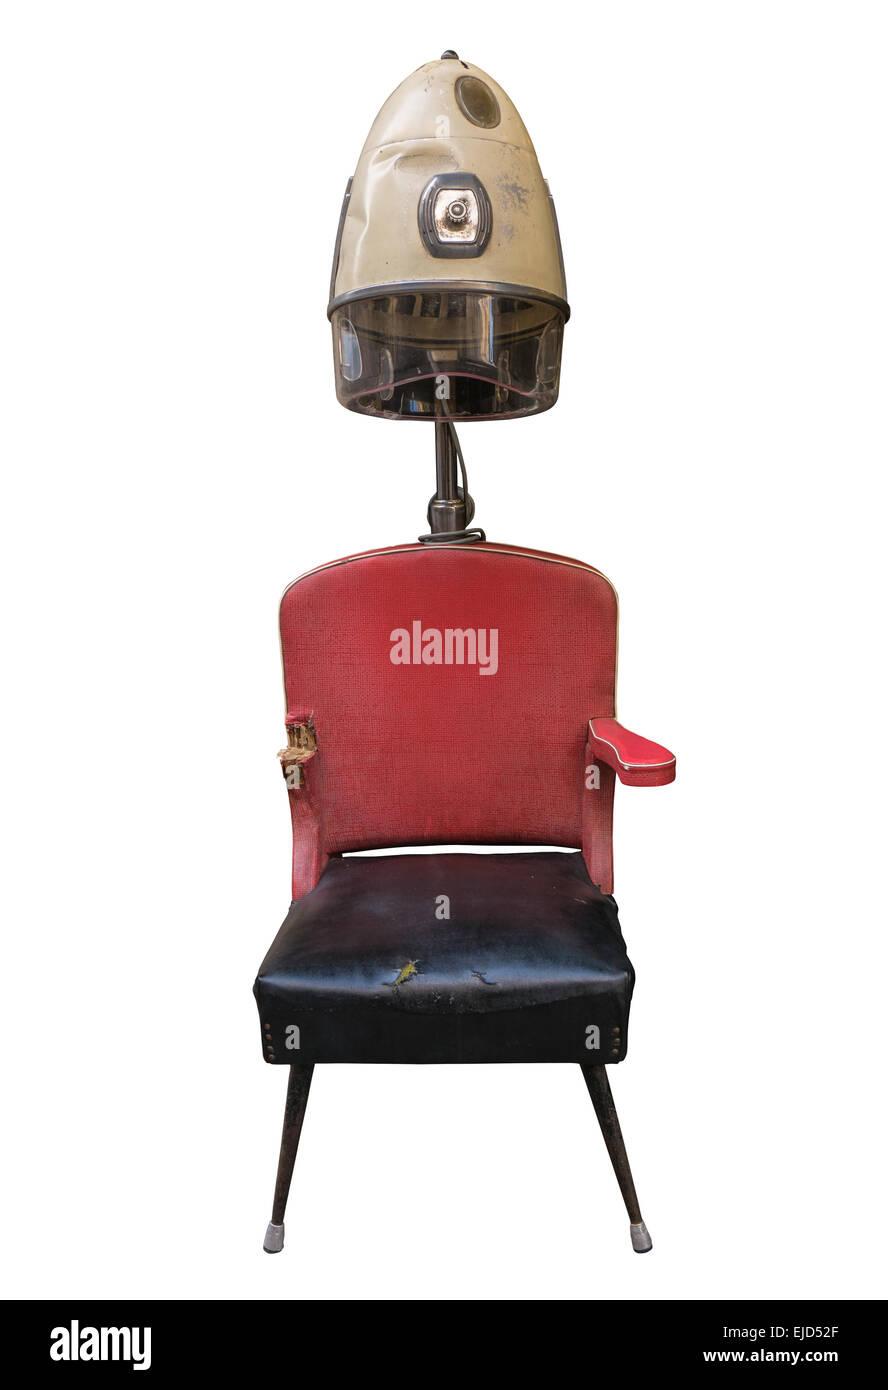 vintage salon chair stock photos vintage salon chair stock images